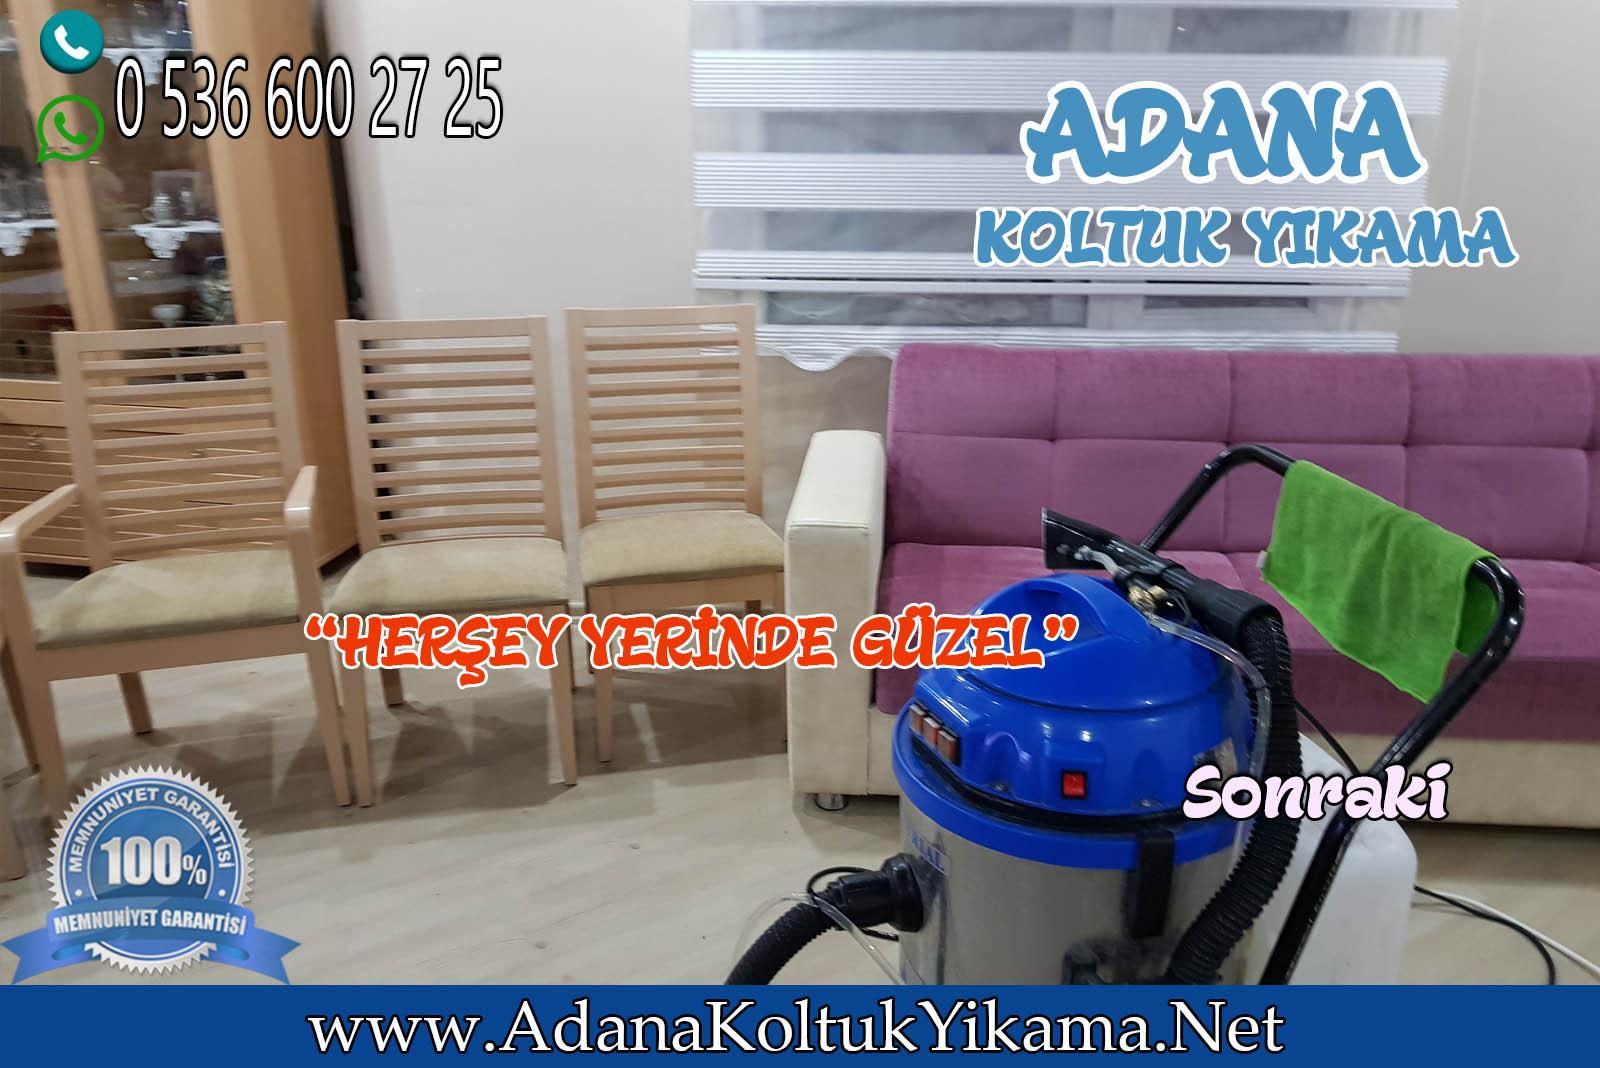 Adana Çukurova Koltuk Yıkama Toros Mahallesi